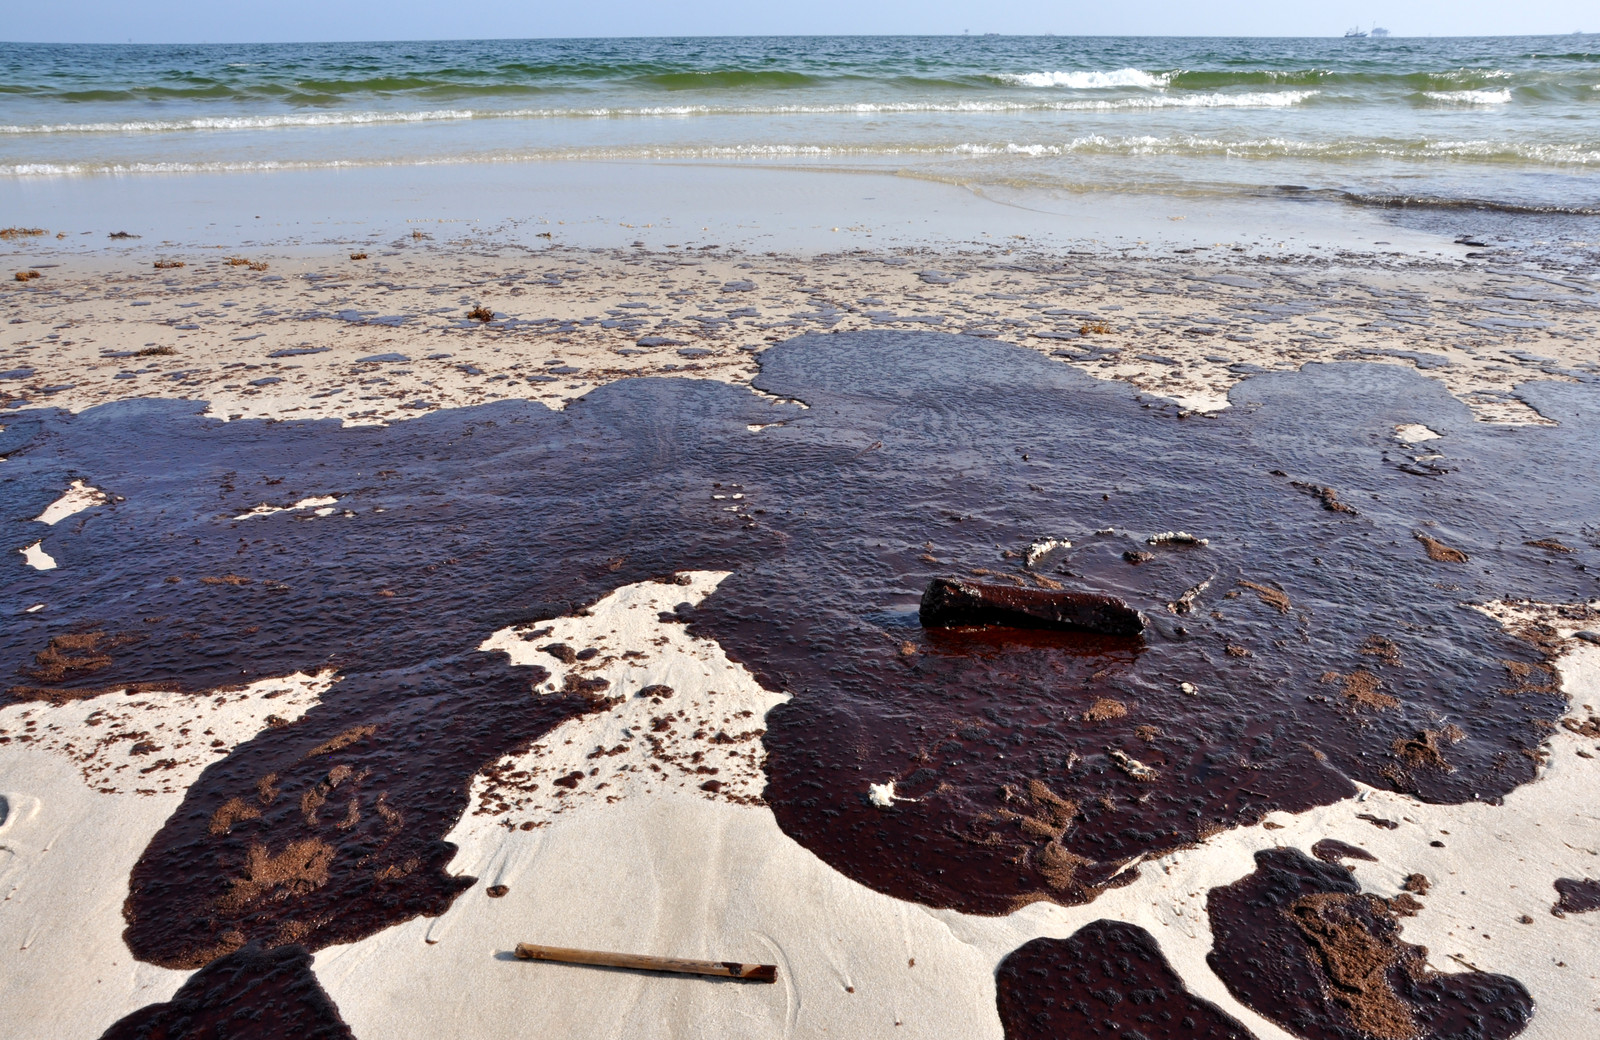 разлив нефти в Белом море